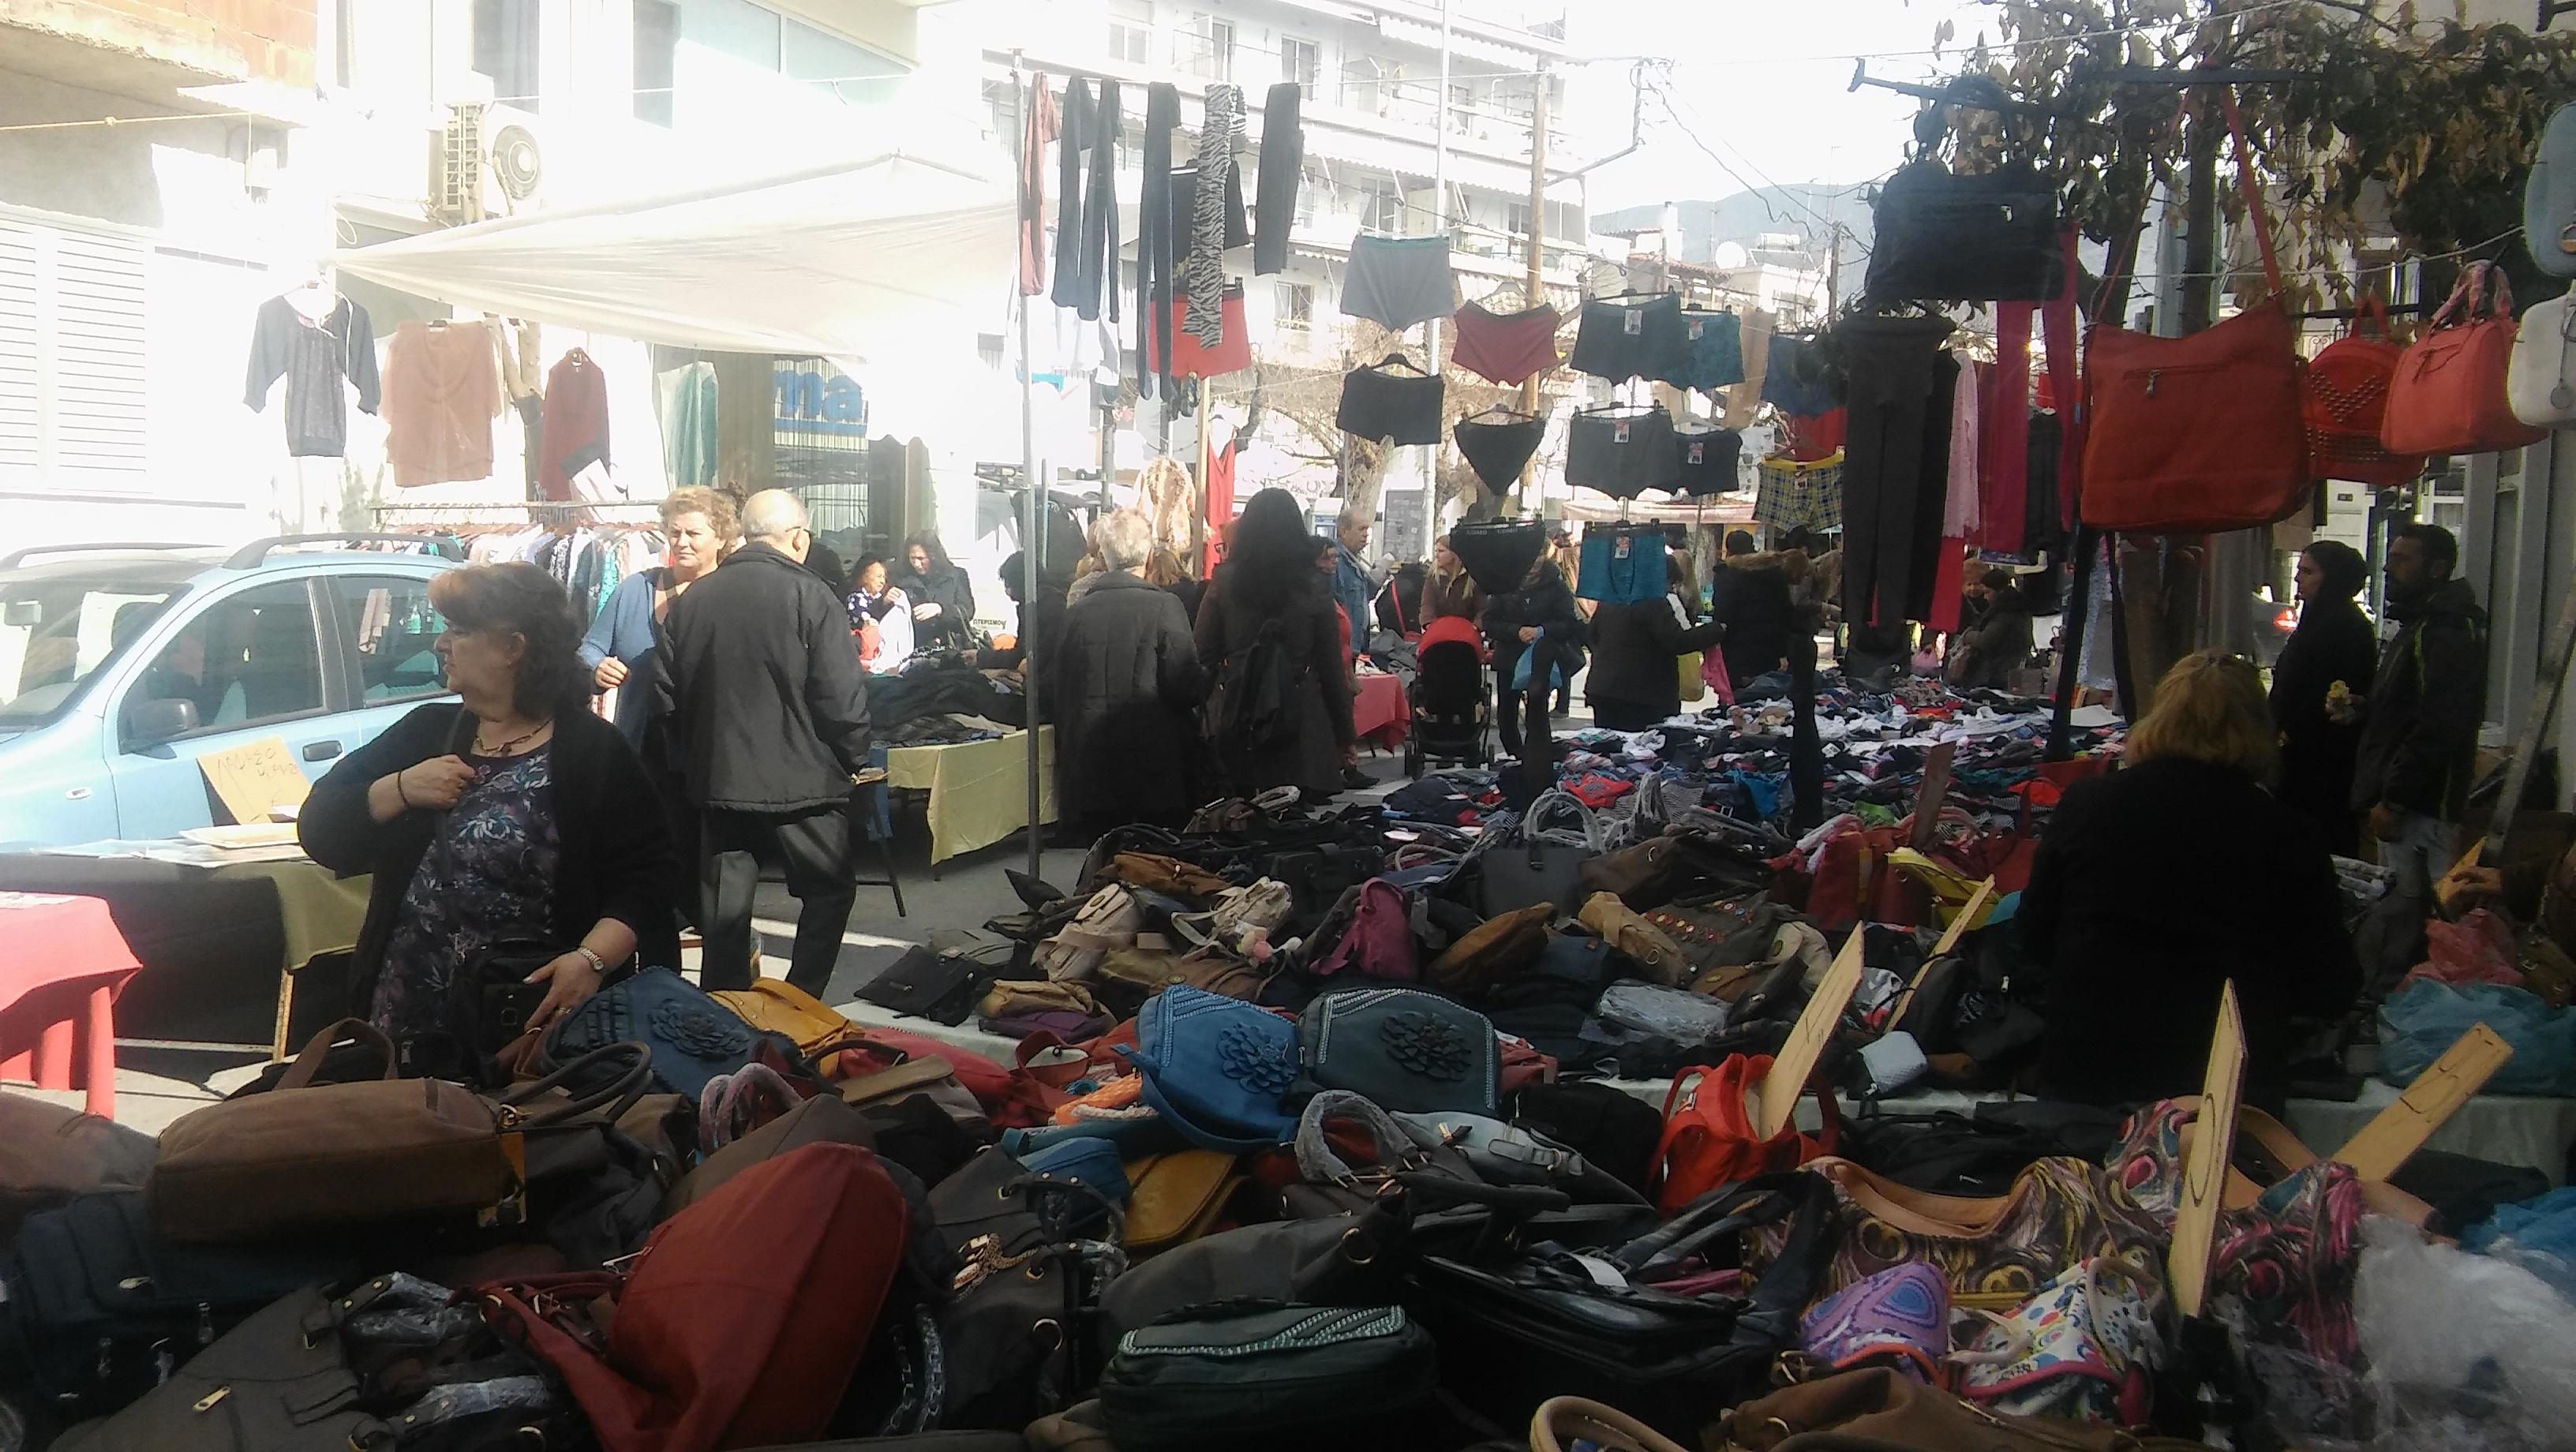 75db1df99882 Kατακόρυφη μείωση ζήτησης ρούχων στις λαϊκές αγορές του Βόλου - e ...